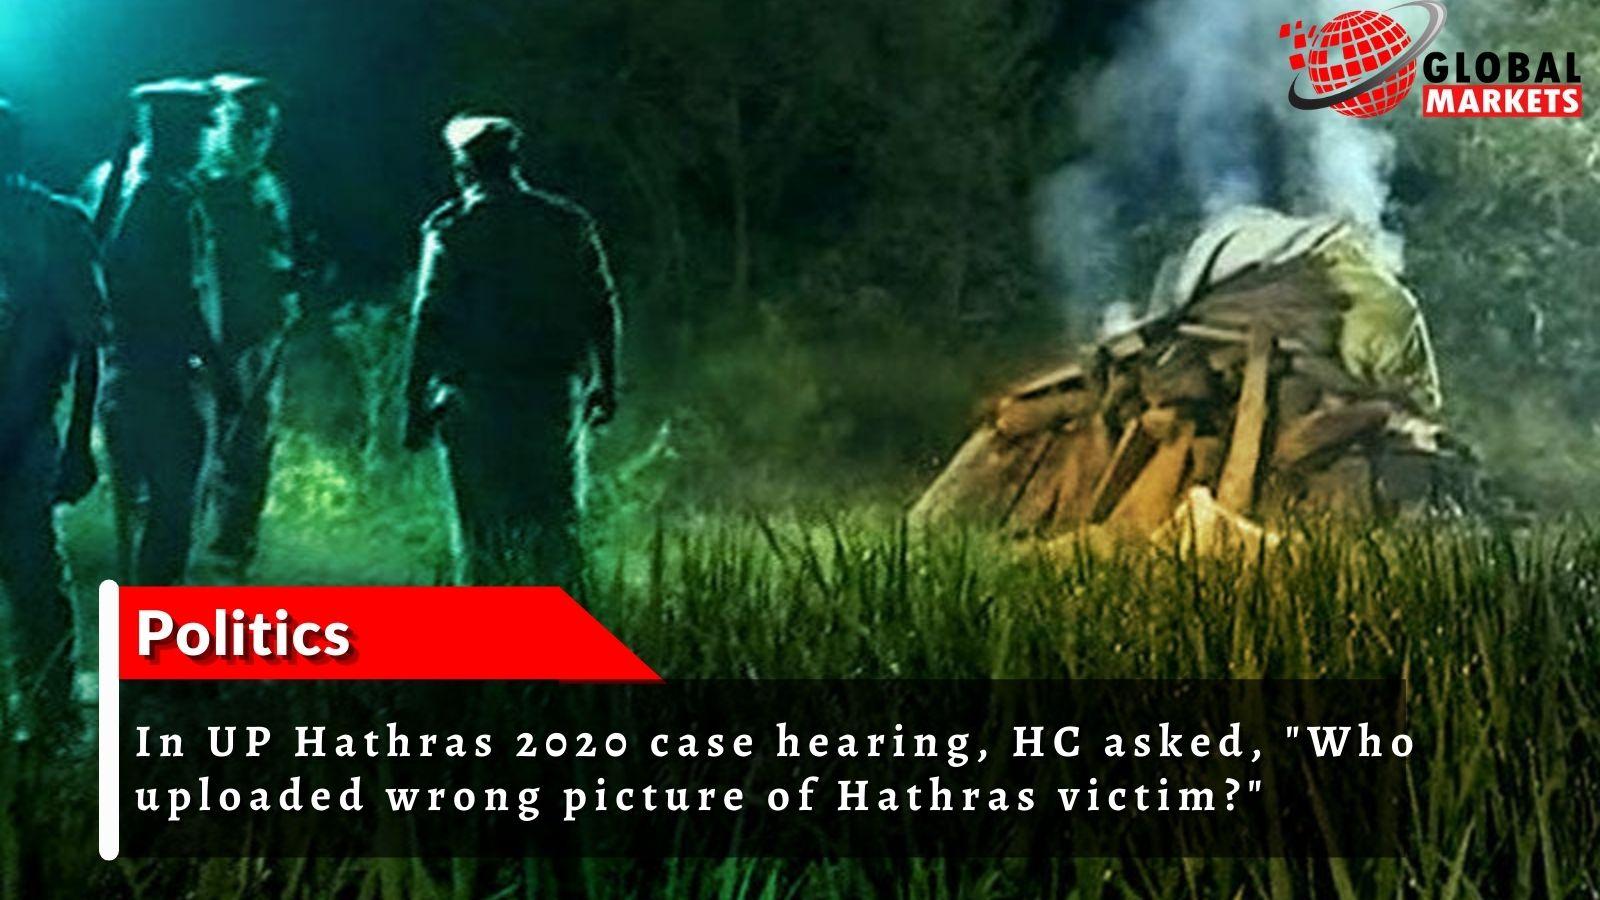 In Hathras case hearing, HC asked,